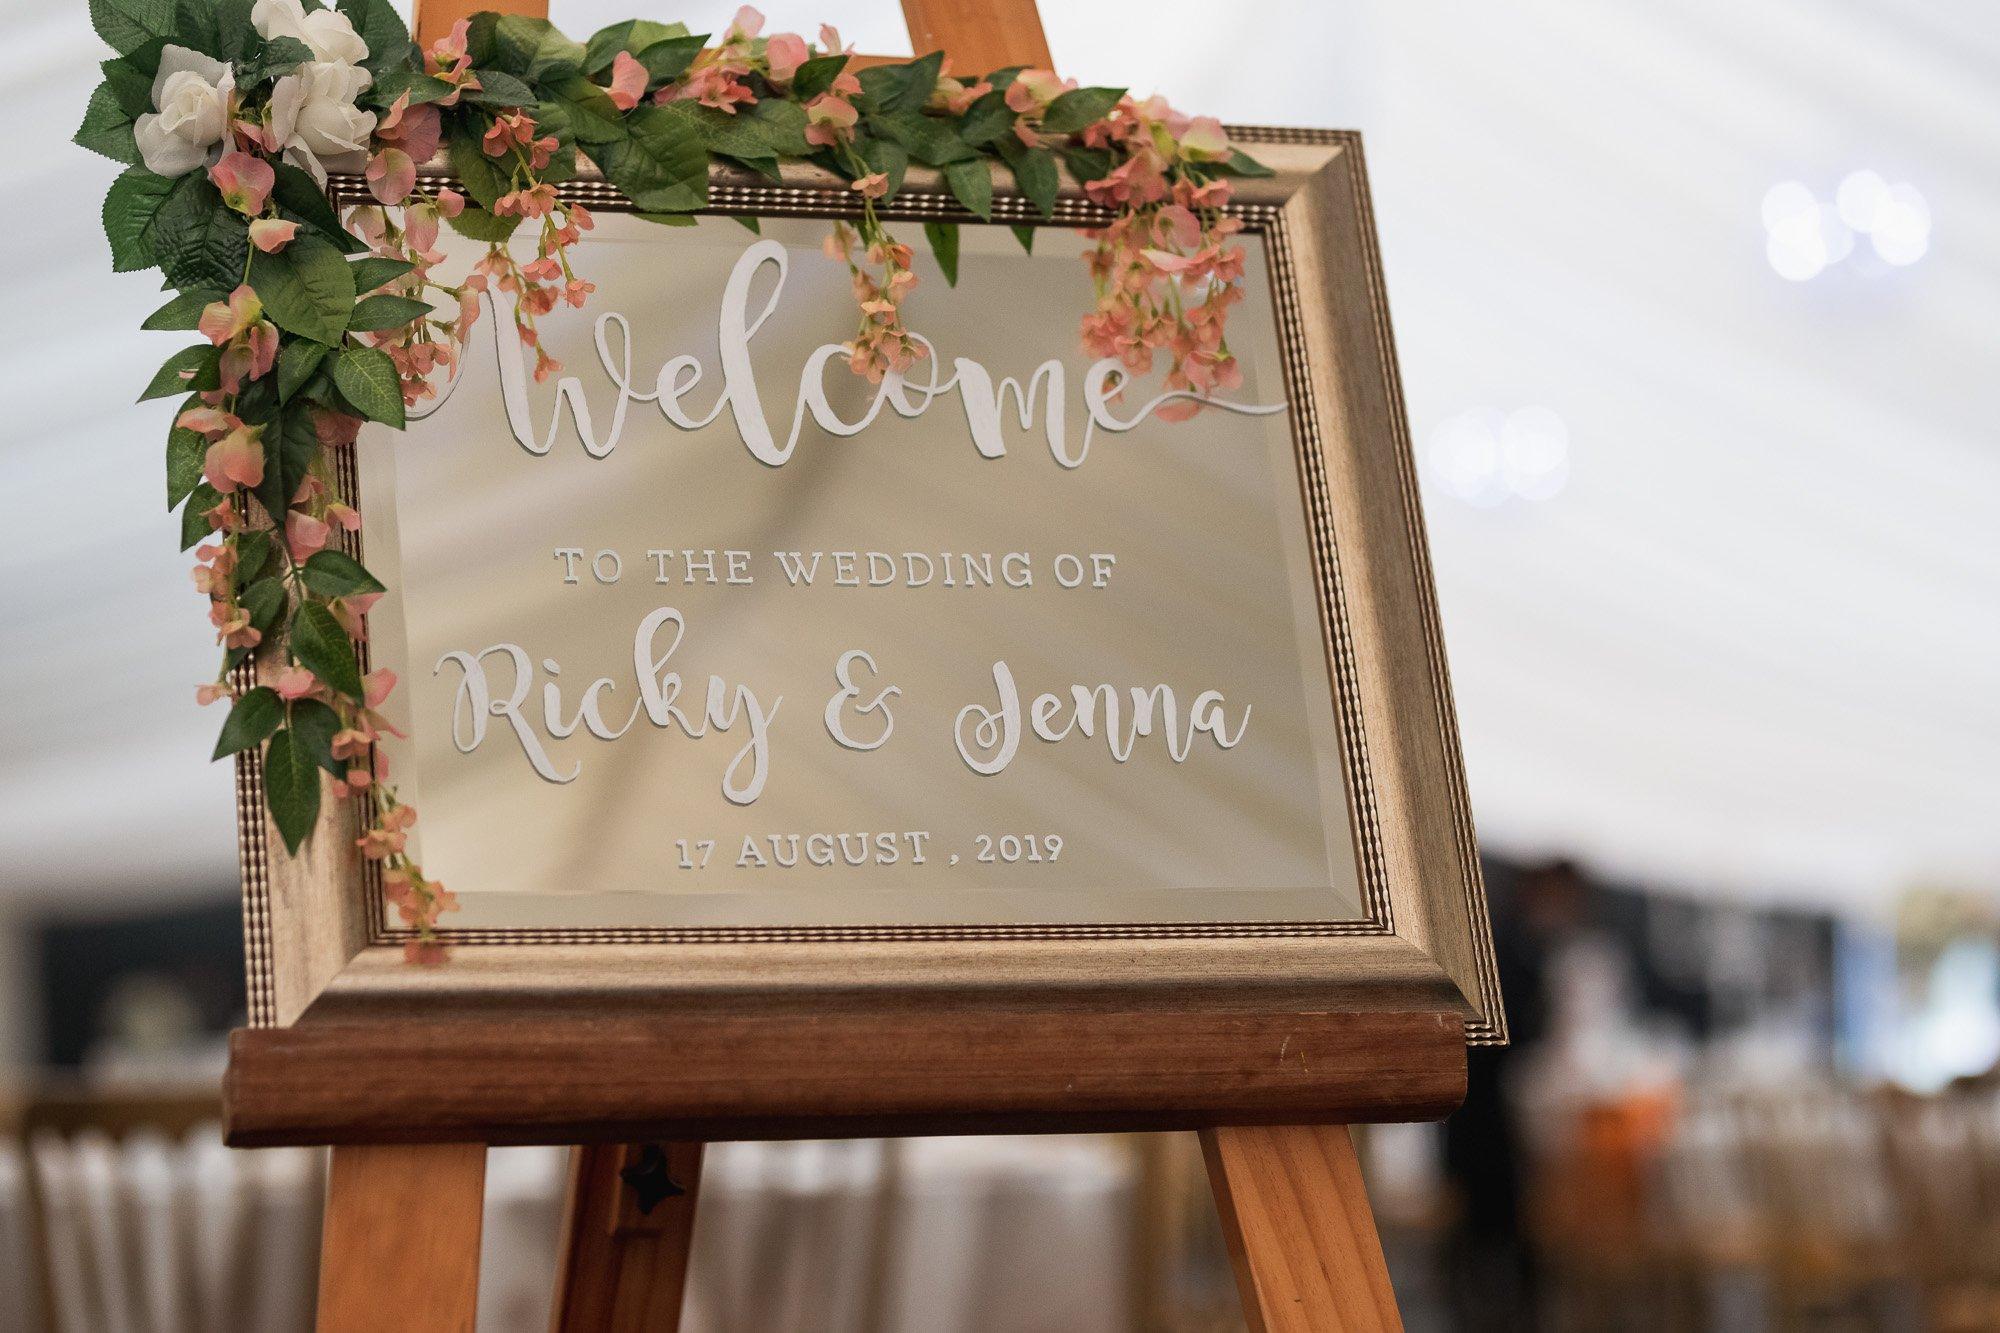 Dunchurch Park Hotel, Asian wedding photographer Midlands, reception